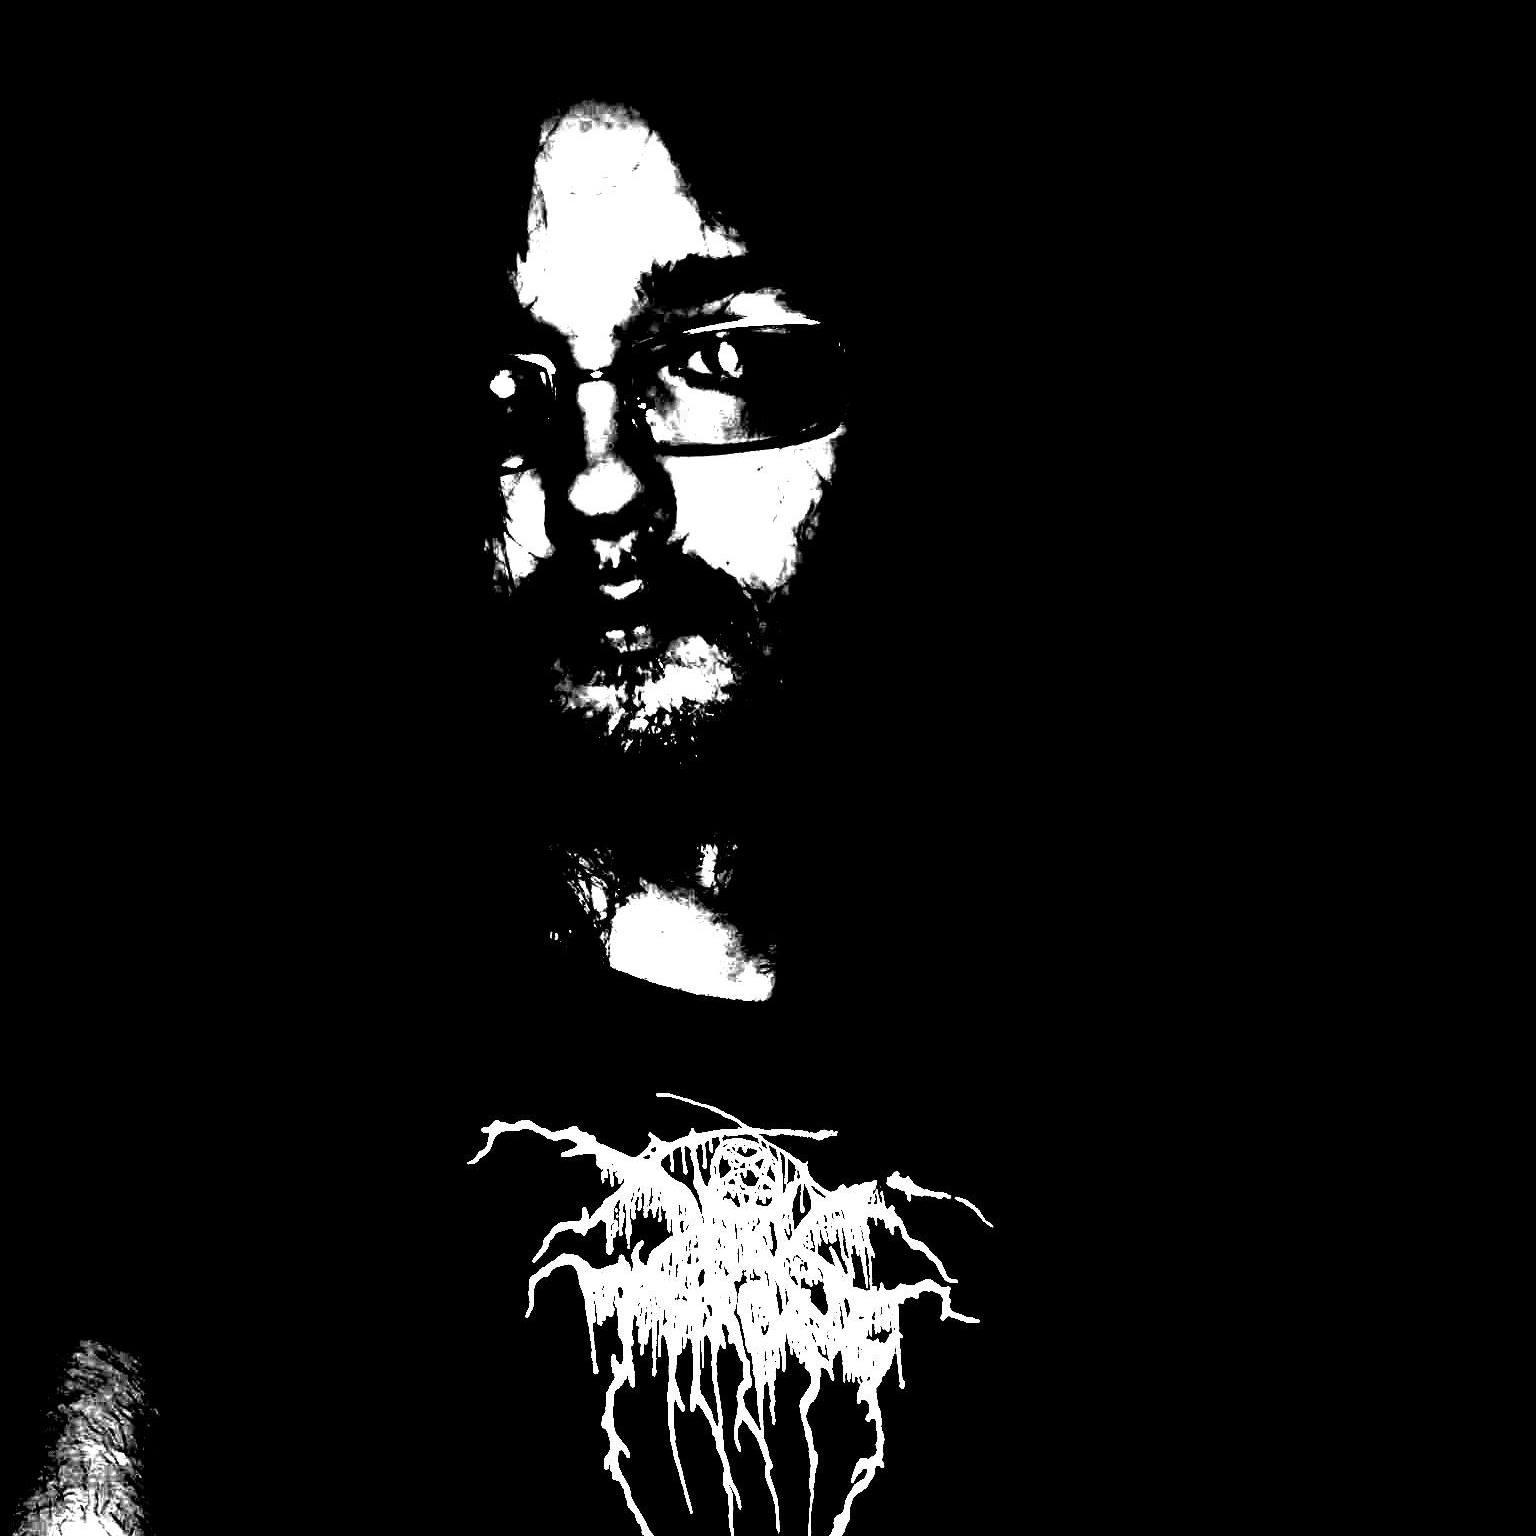 Wyngs ov Despair - Photo